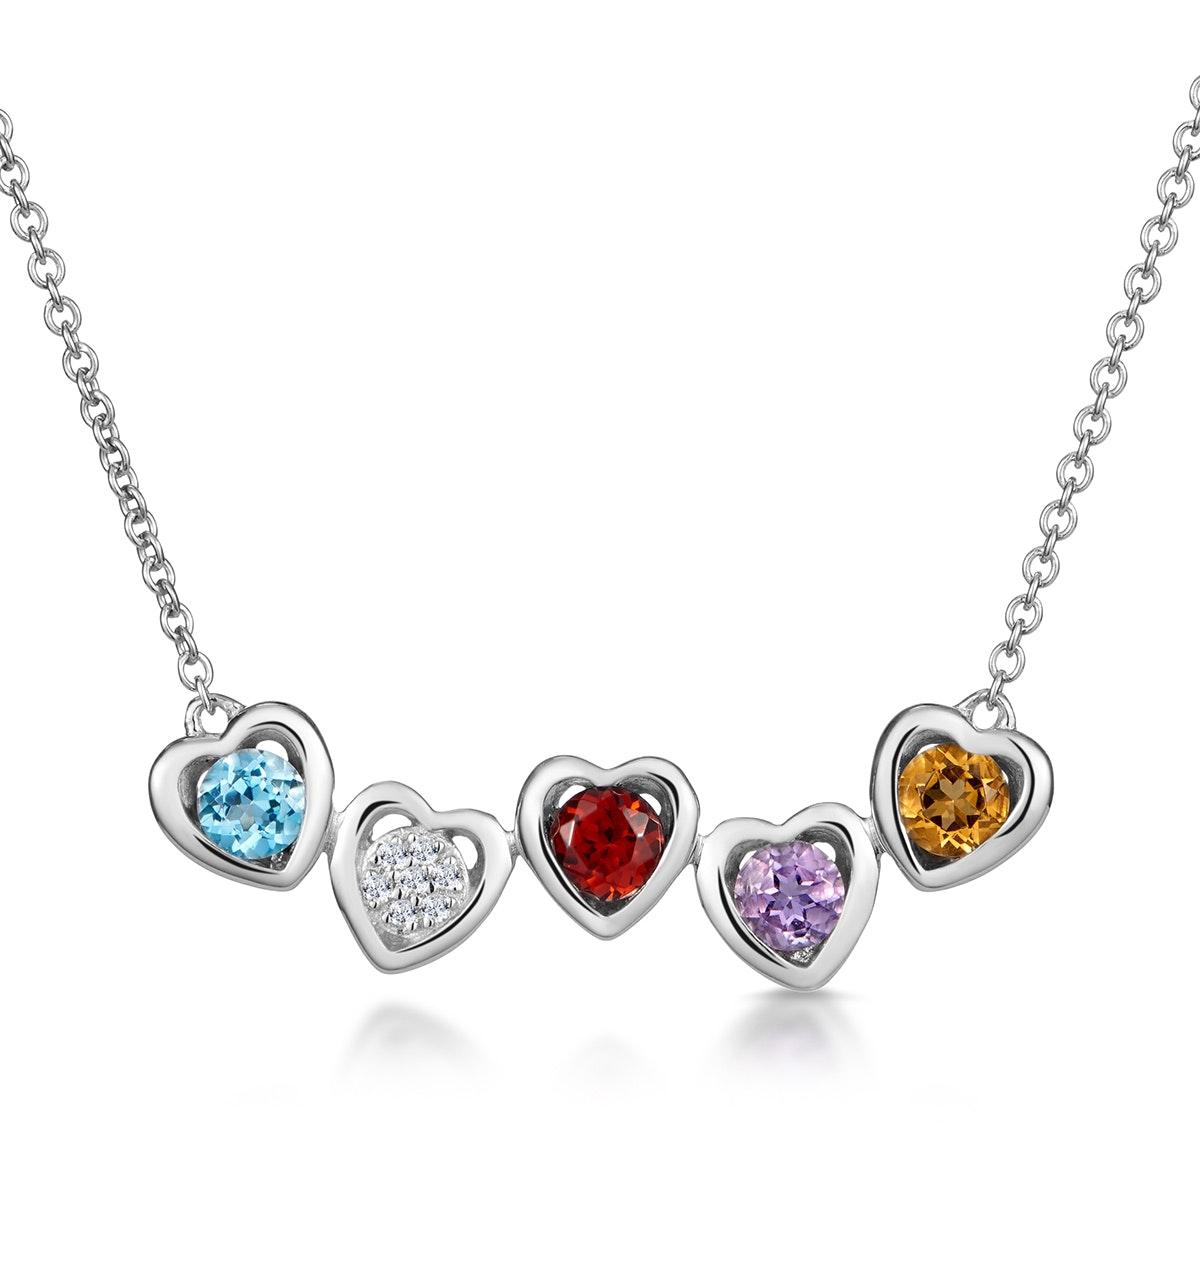 Multi Gem and Diamond Stellato Heart Necklace in 9K White Gold